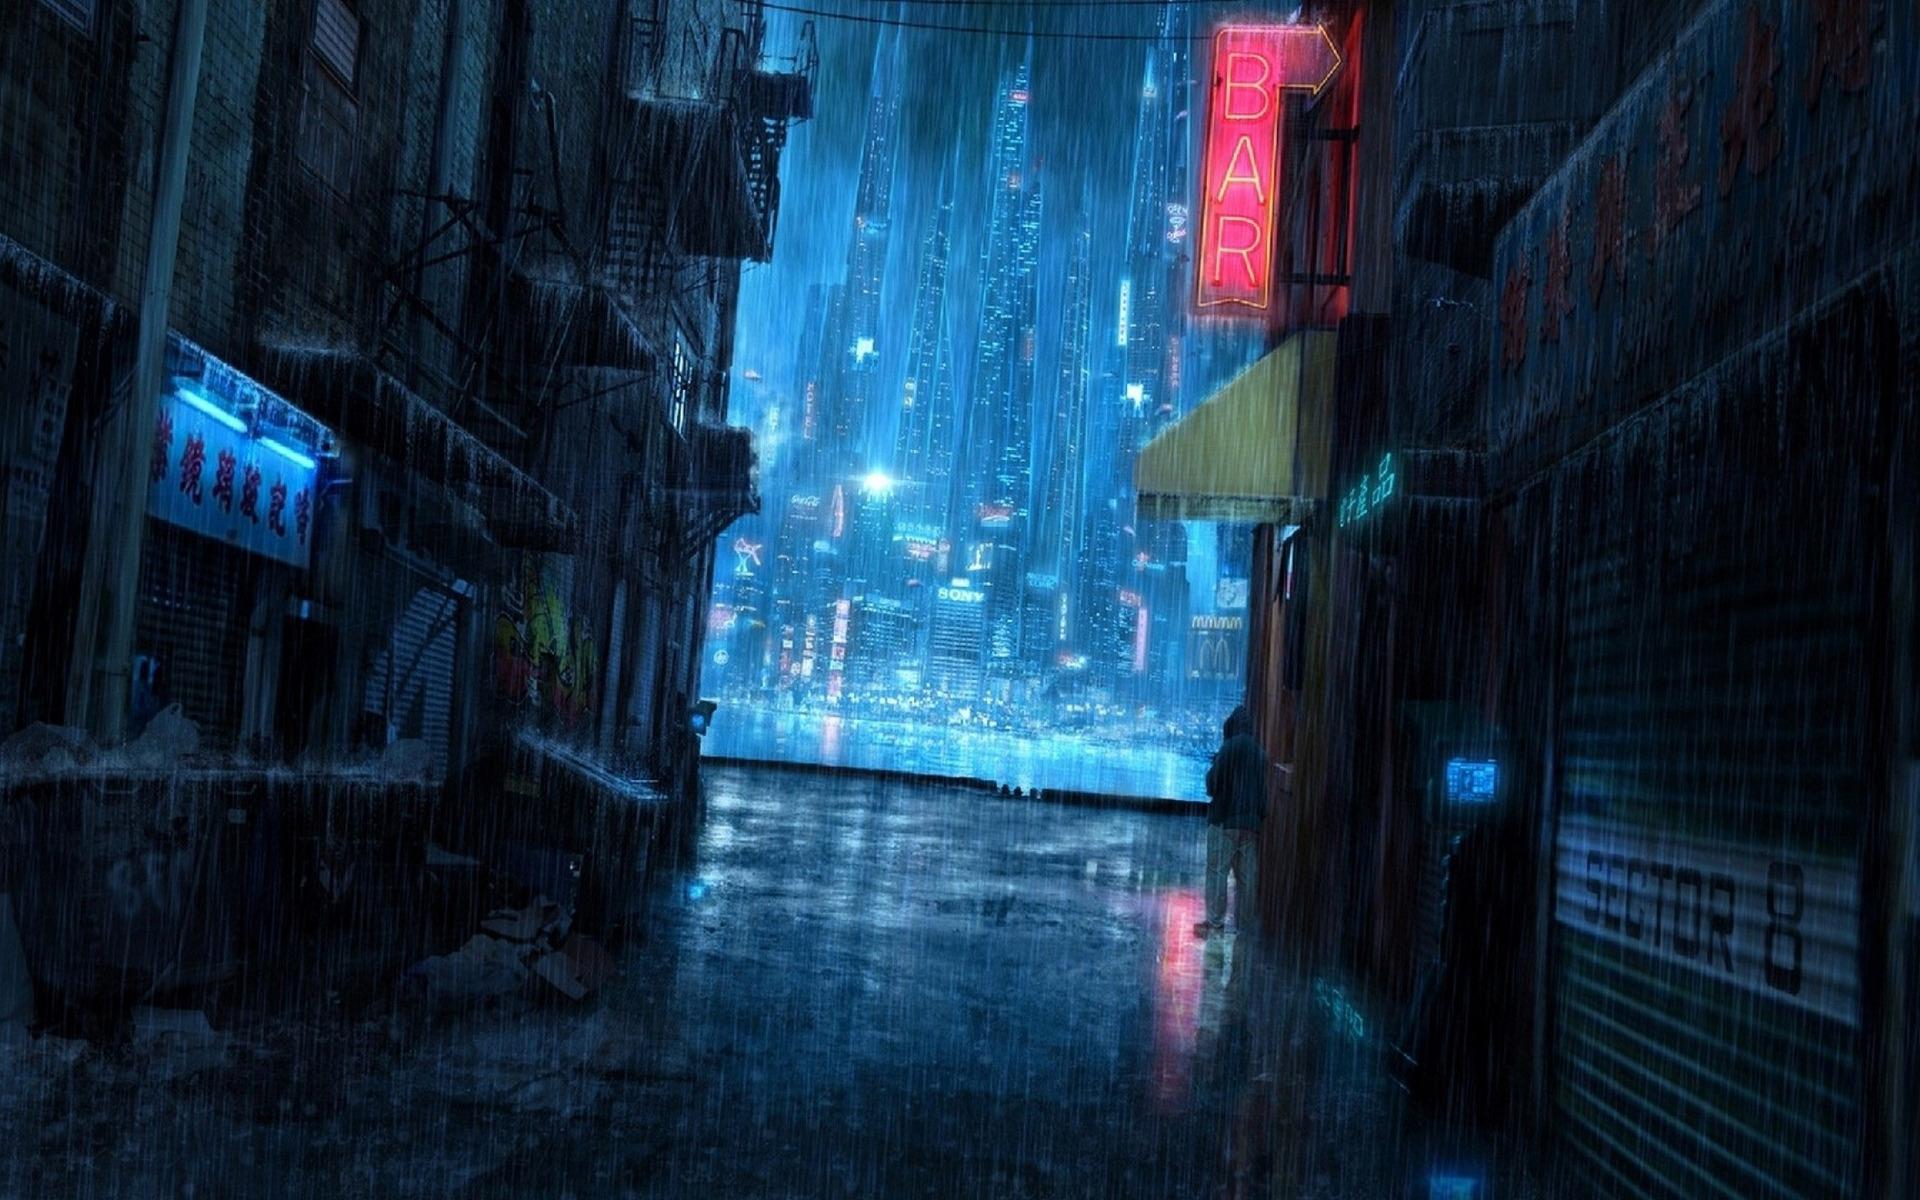 Download Cyberpunk city wallpaper 1920x1200